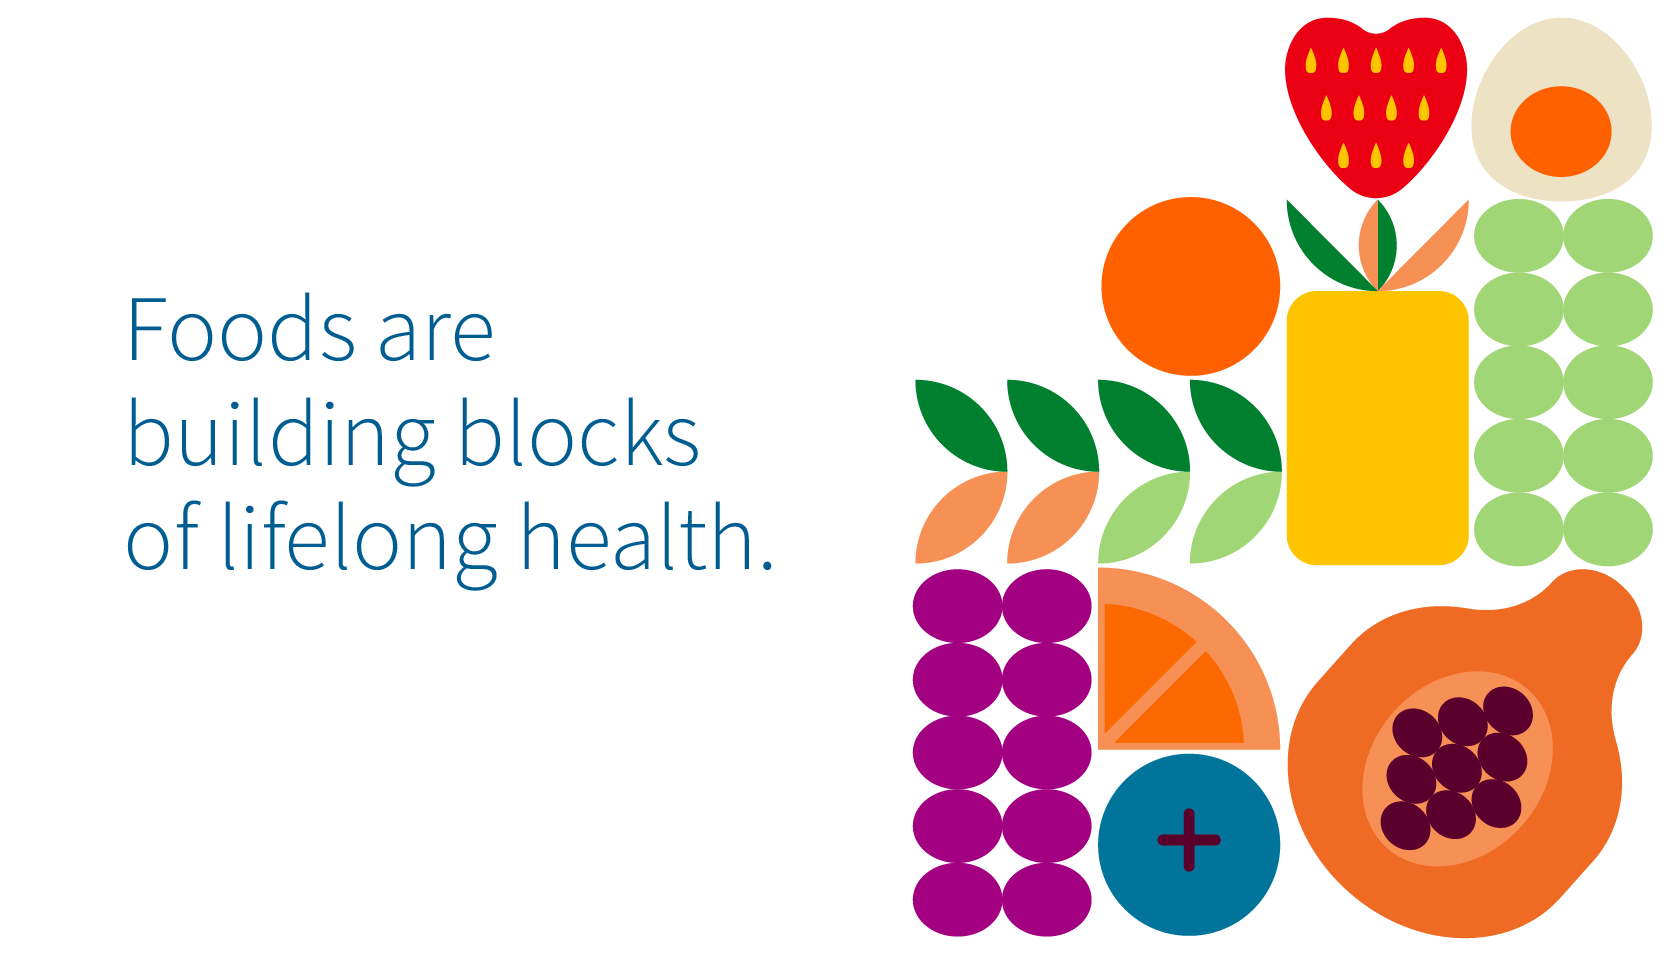 Foods are building blocks of lifelong health